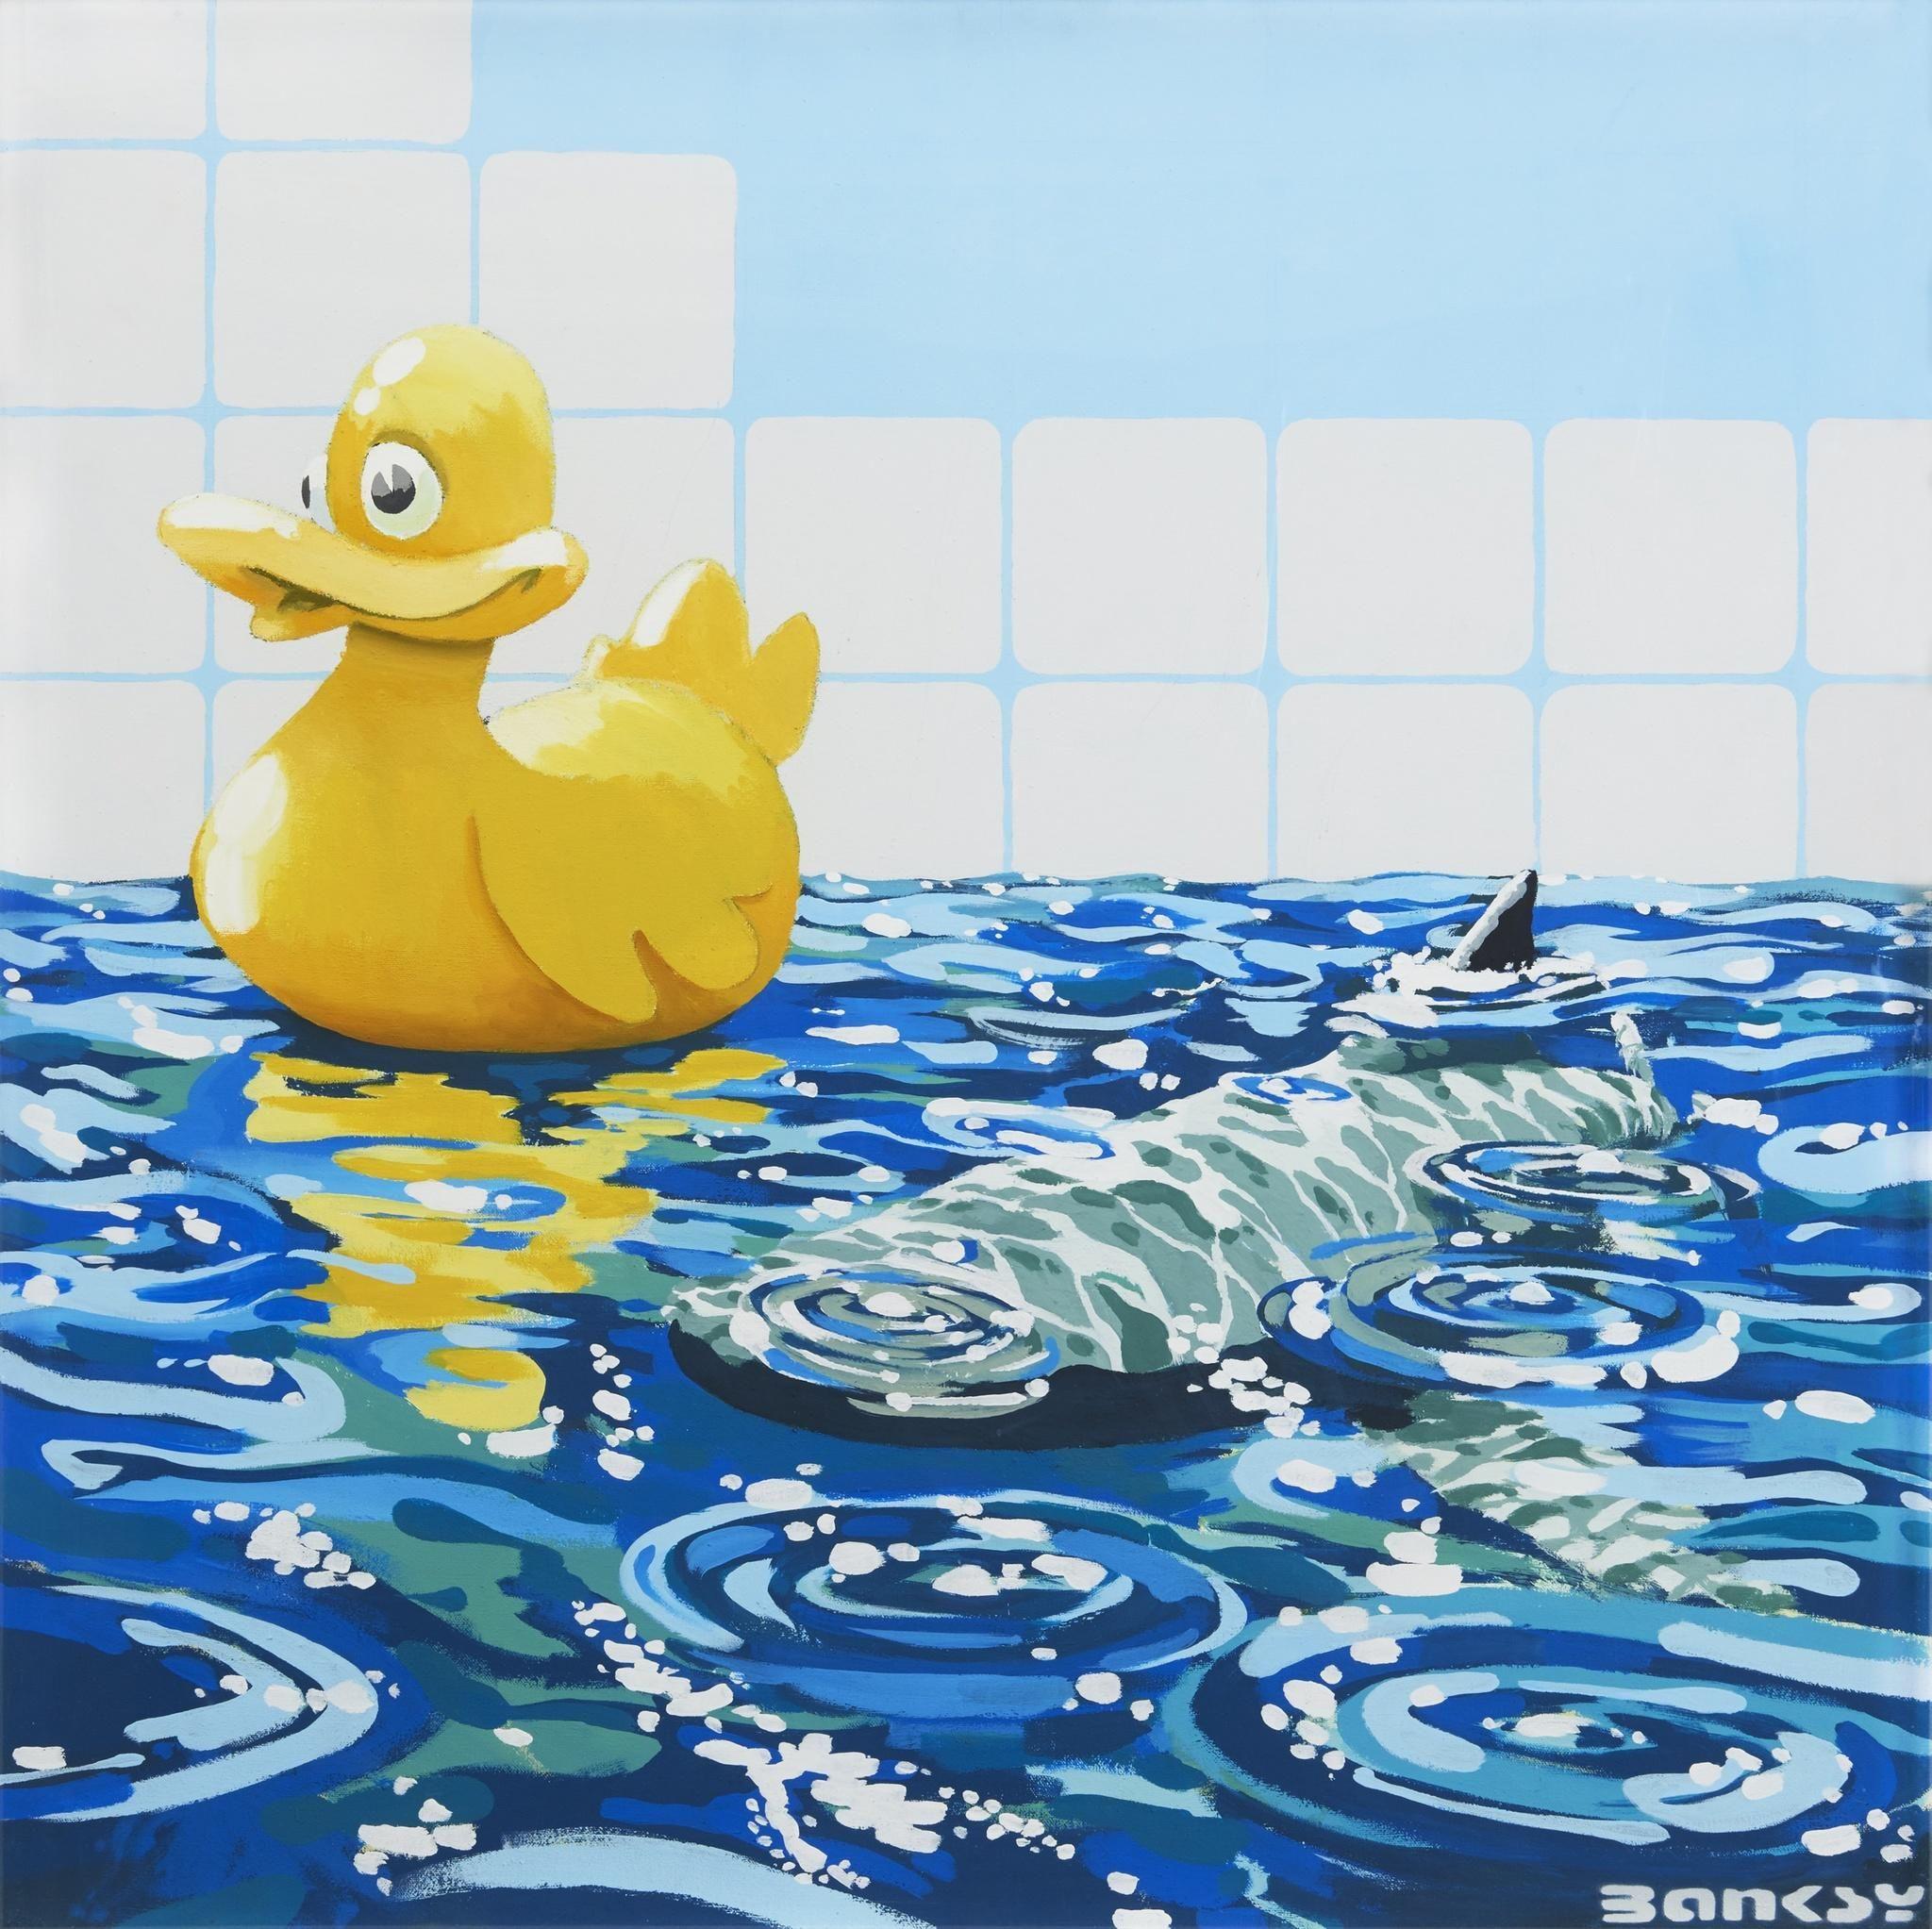 Rubber ducky - Banksy 2006 | Banksy | Pinterest | Banksy, Bansky and ...